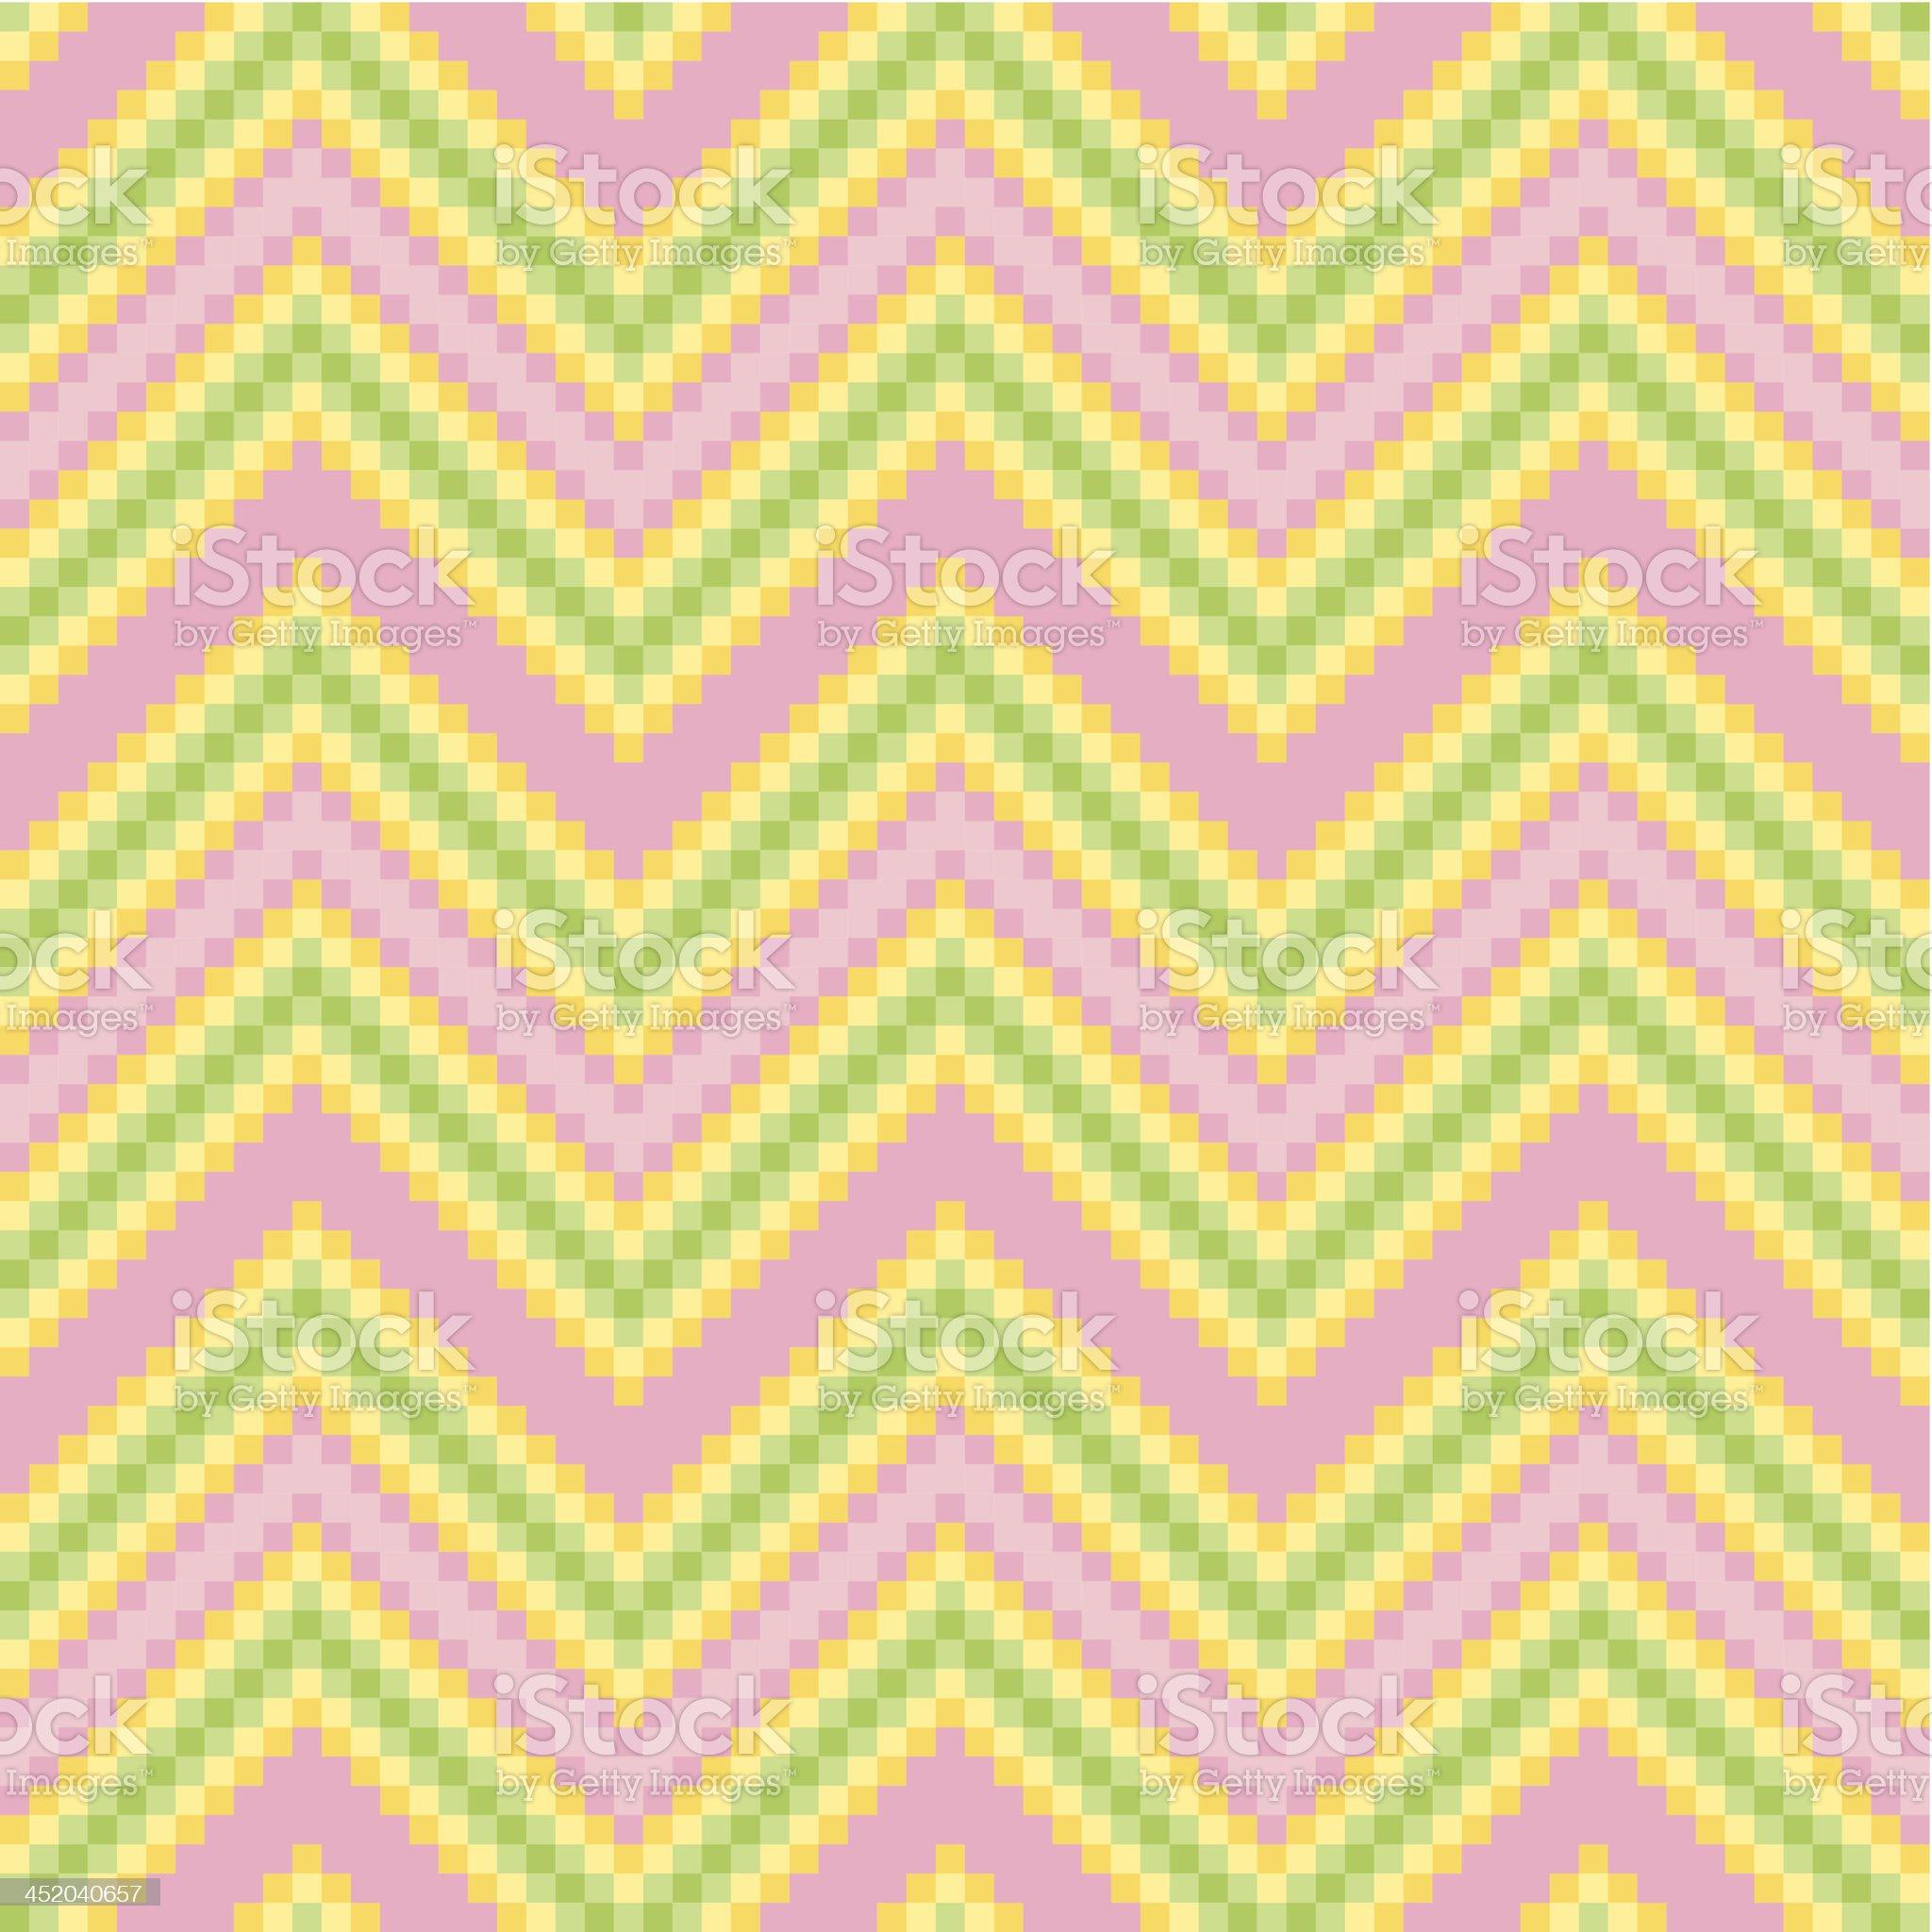 Seamless Zigzag Mosaic pixel pattern royalty-free stock vector art